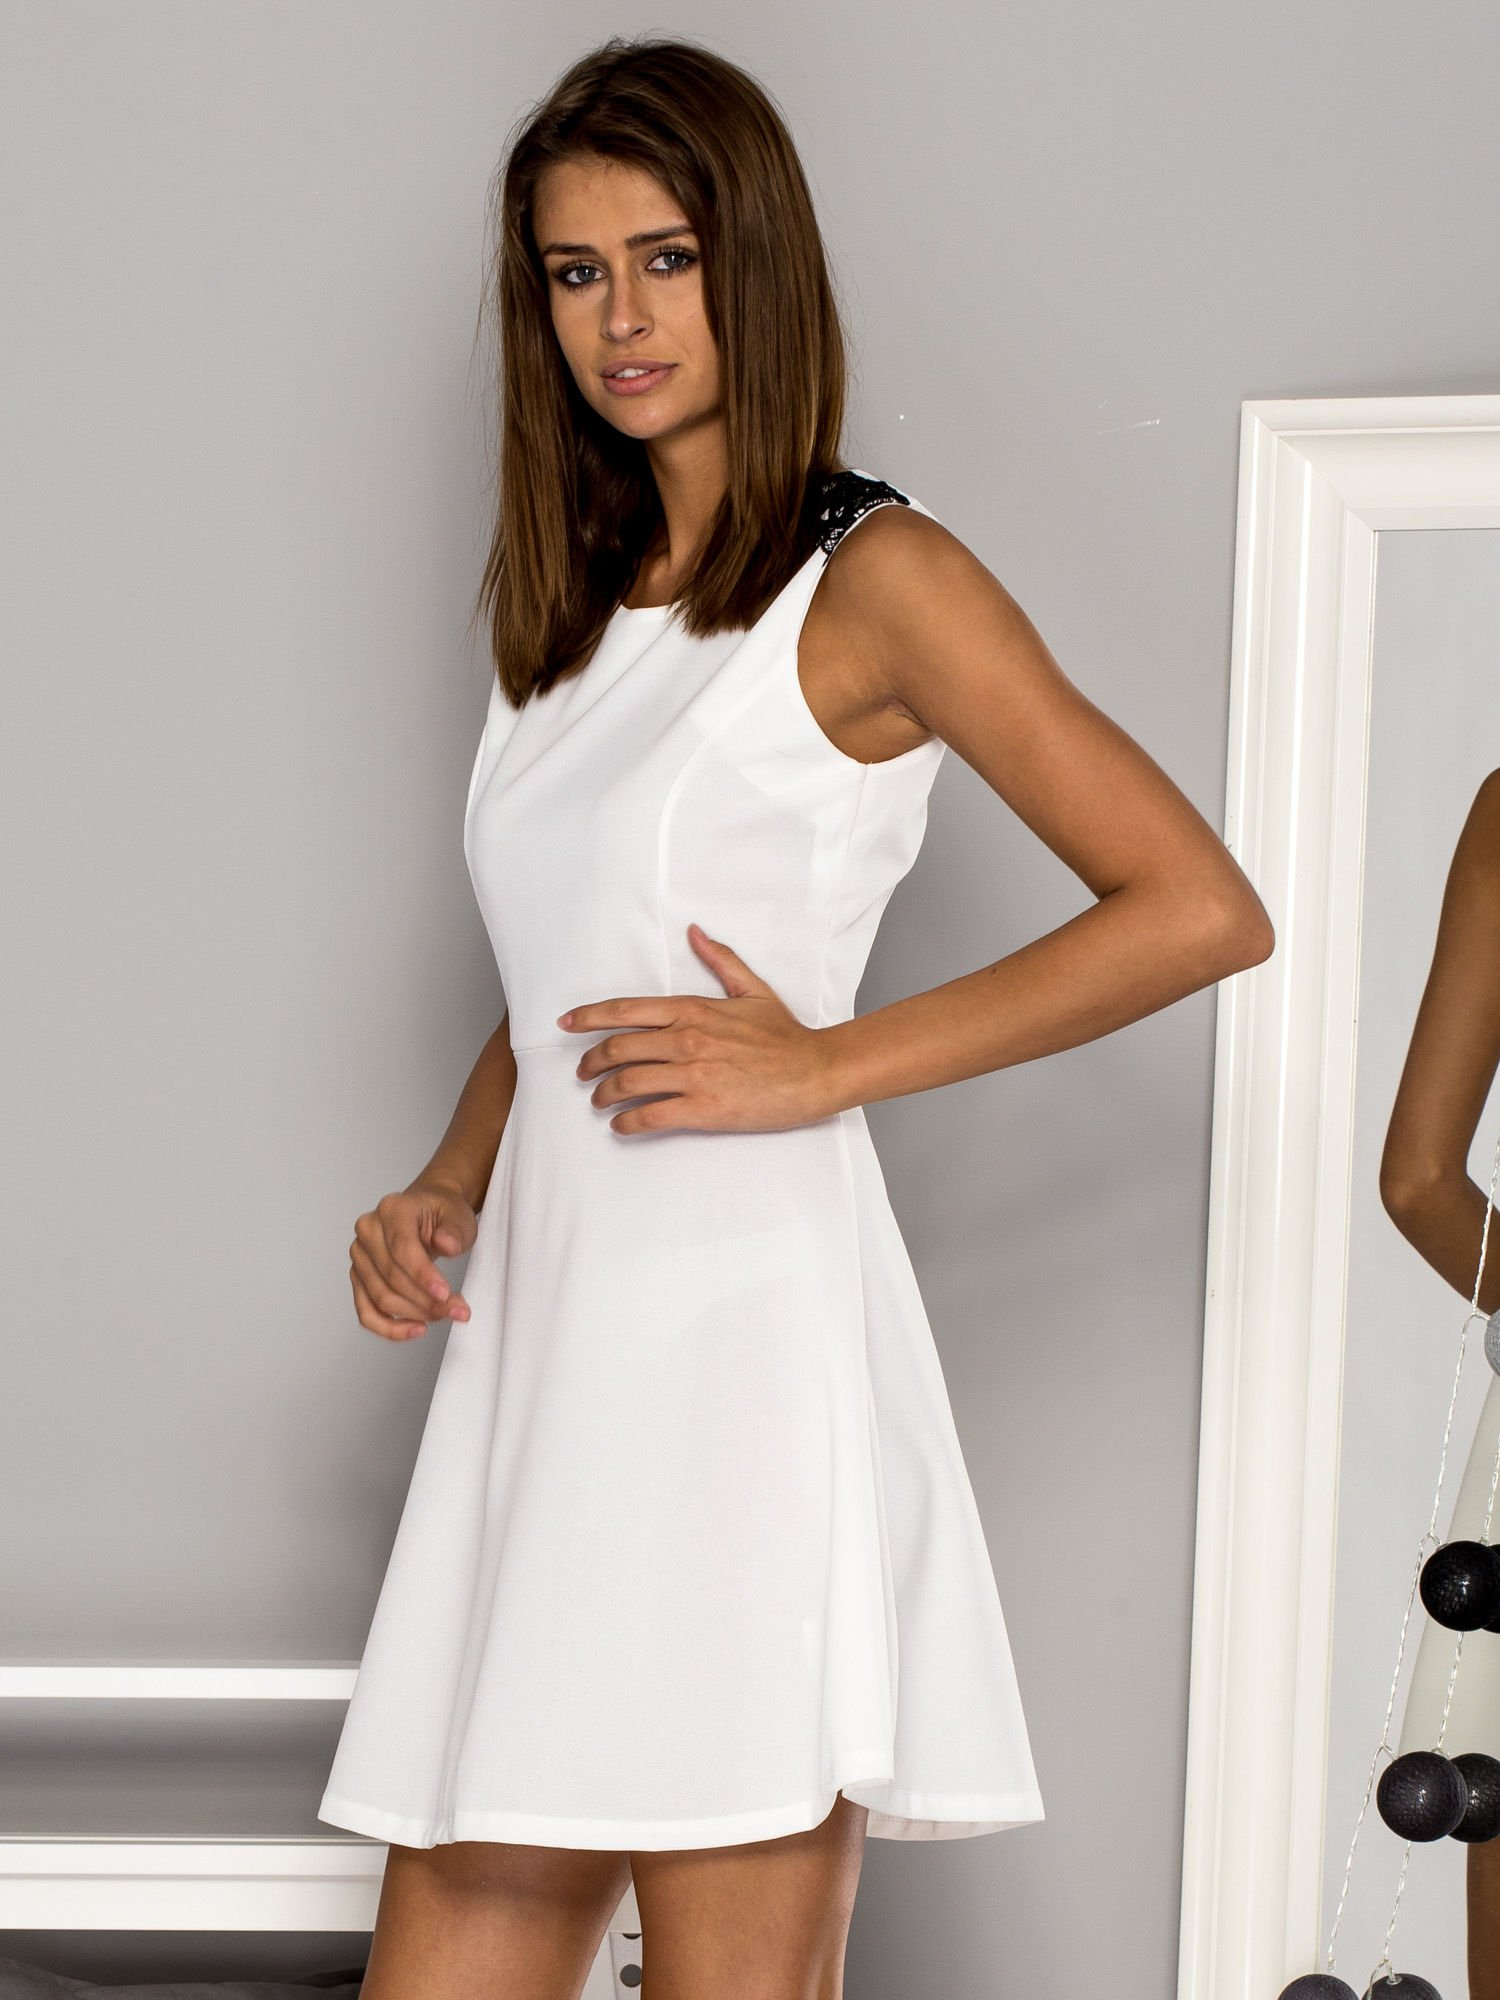 aa8fb6d32c Biała sukienka koktajlowa z koronkowymi wstawkami - Sukienka ...